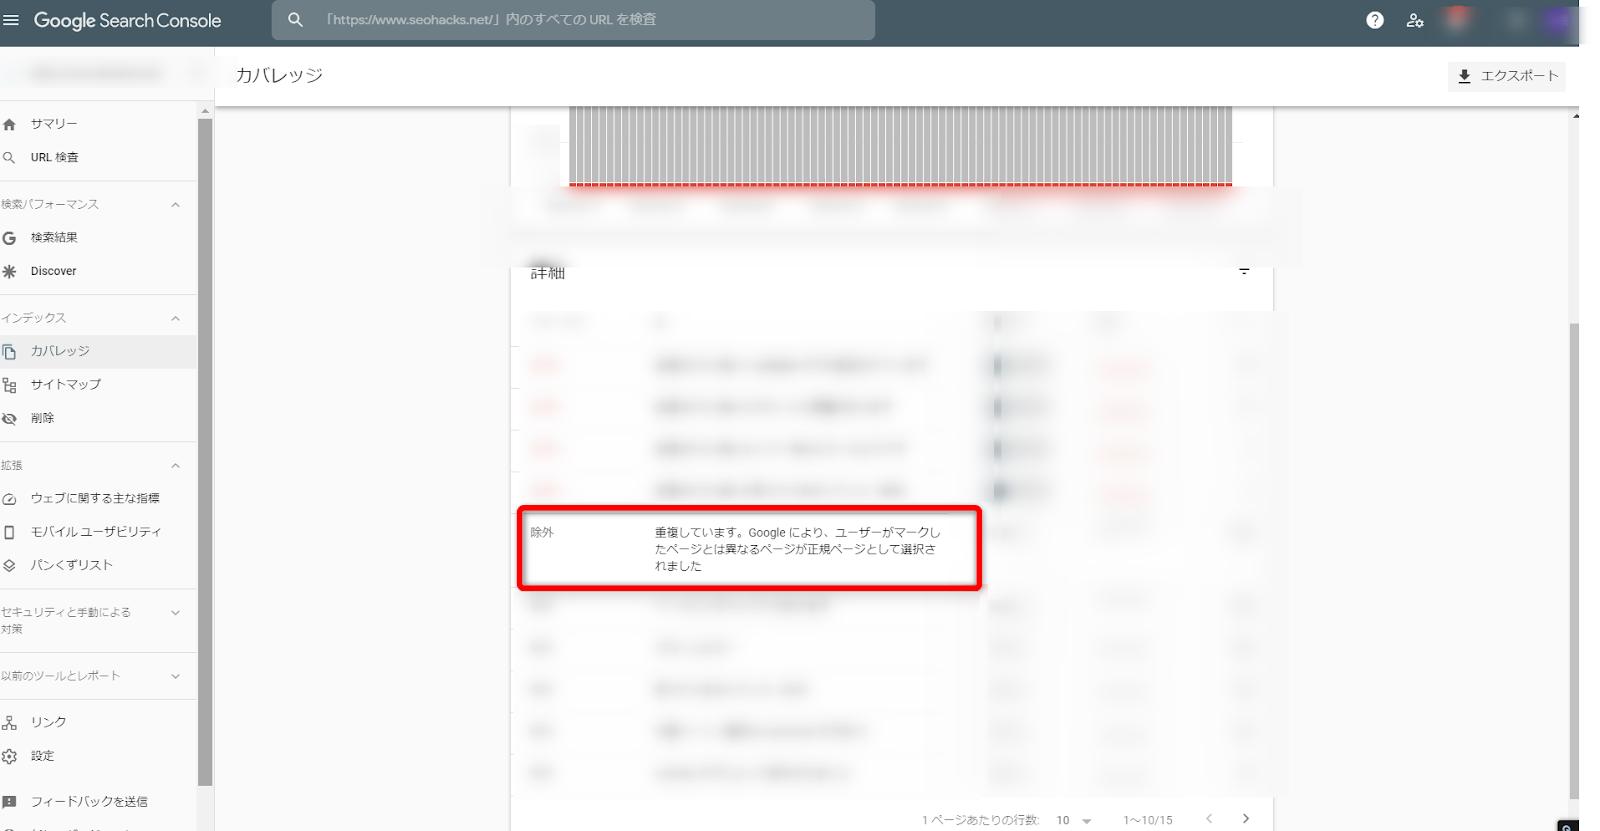 Google Search Consoleのカバレッジ確認のスクリーンショット